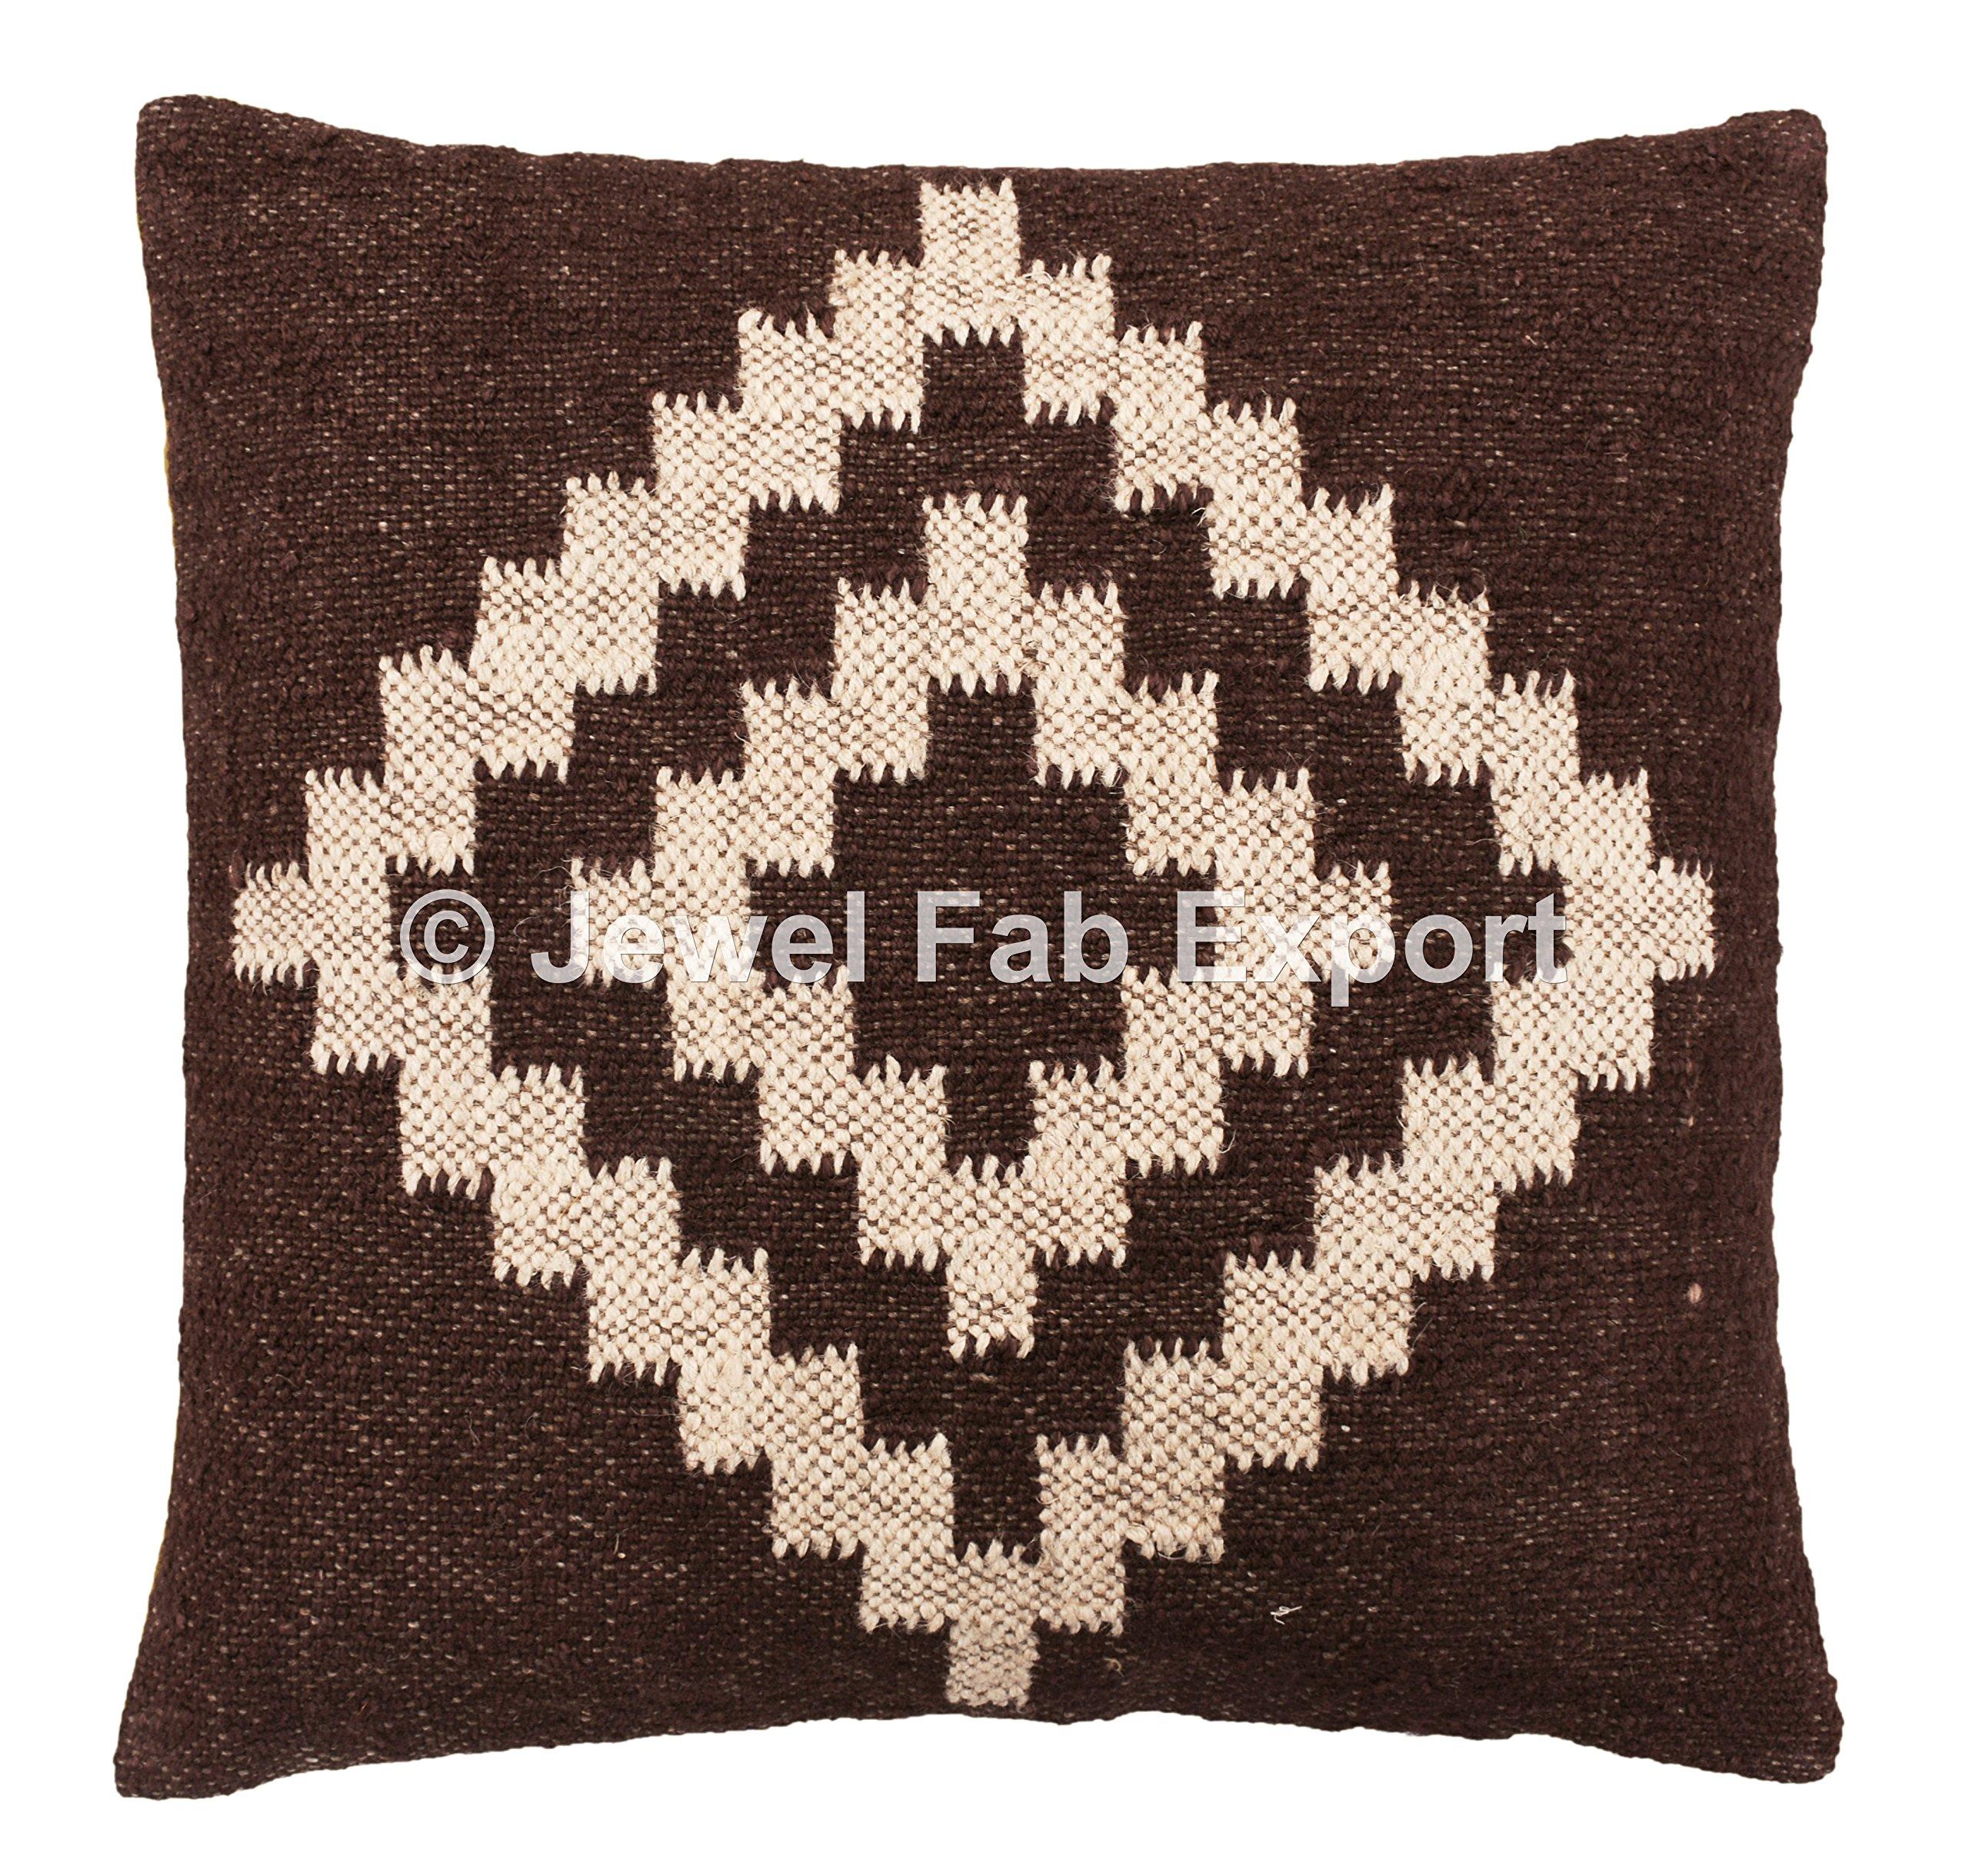 Indian Ethnic Set Of 5 Kilim Rug Floor Home Decor Kilim 18 x 18'' Vintage Oriental Ethnic Hippie Handwoven Kilim Pillow,Kilim Cushion Decorative Jute Pillow Sham , Handwoven Jute Rug Cushions